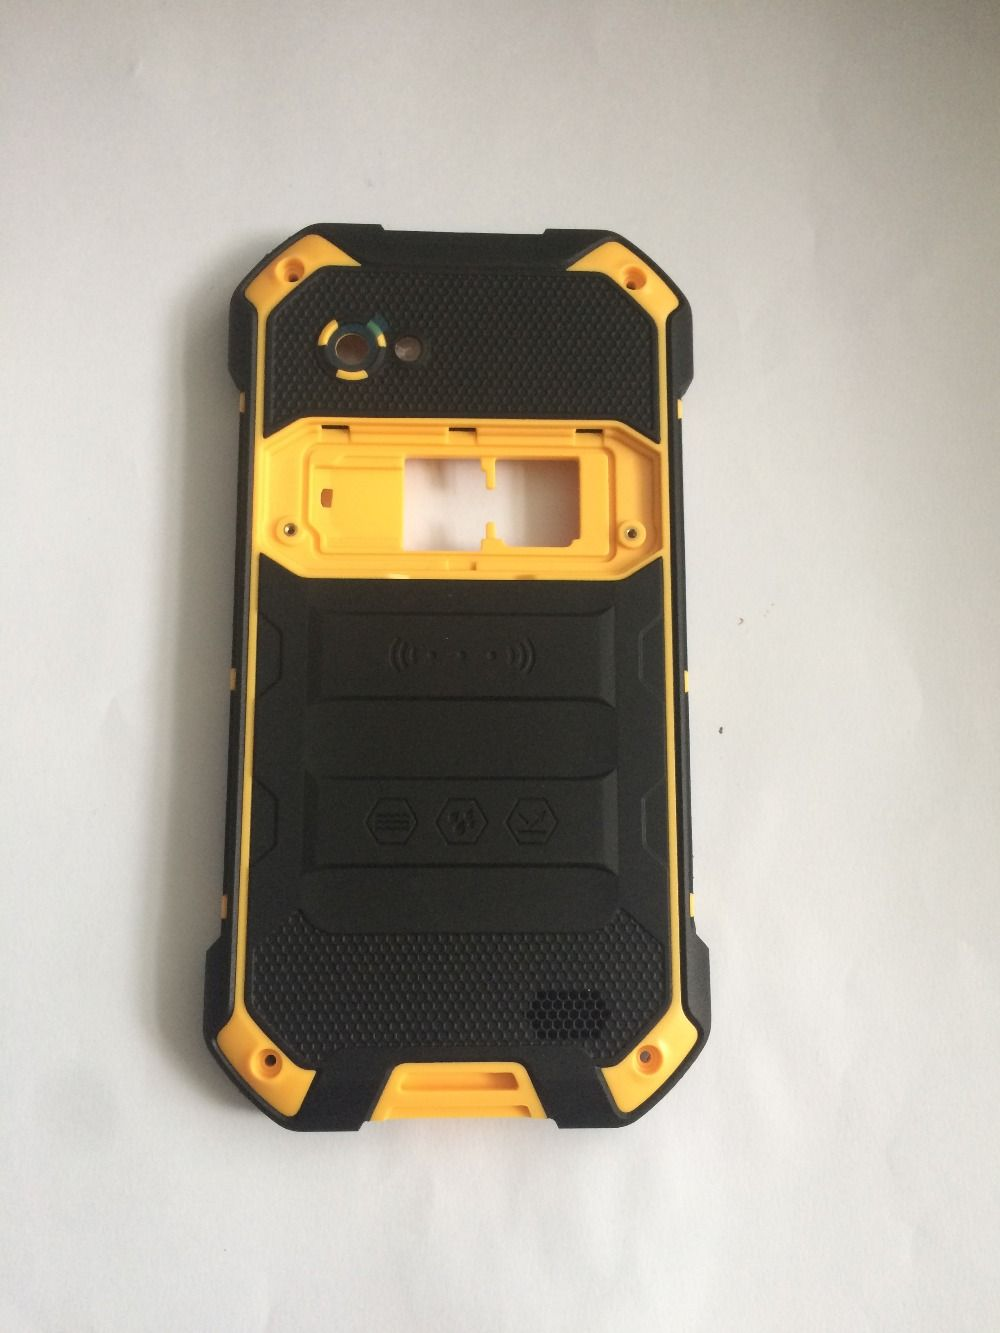 New Blackview BV6000 Batterie-abdeckung Zurück Shell + Lautsprecher Für Blackview BV6000S Telefon Freies verschiffen + spurhaltungszahl